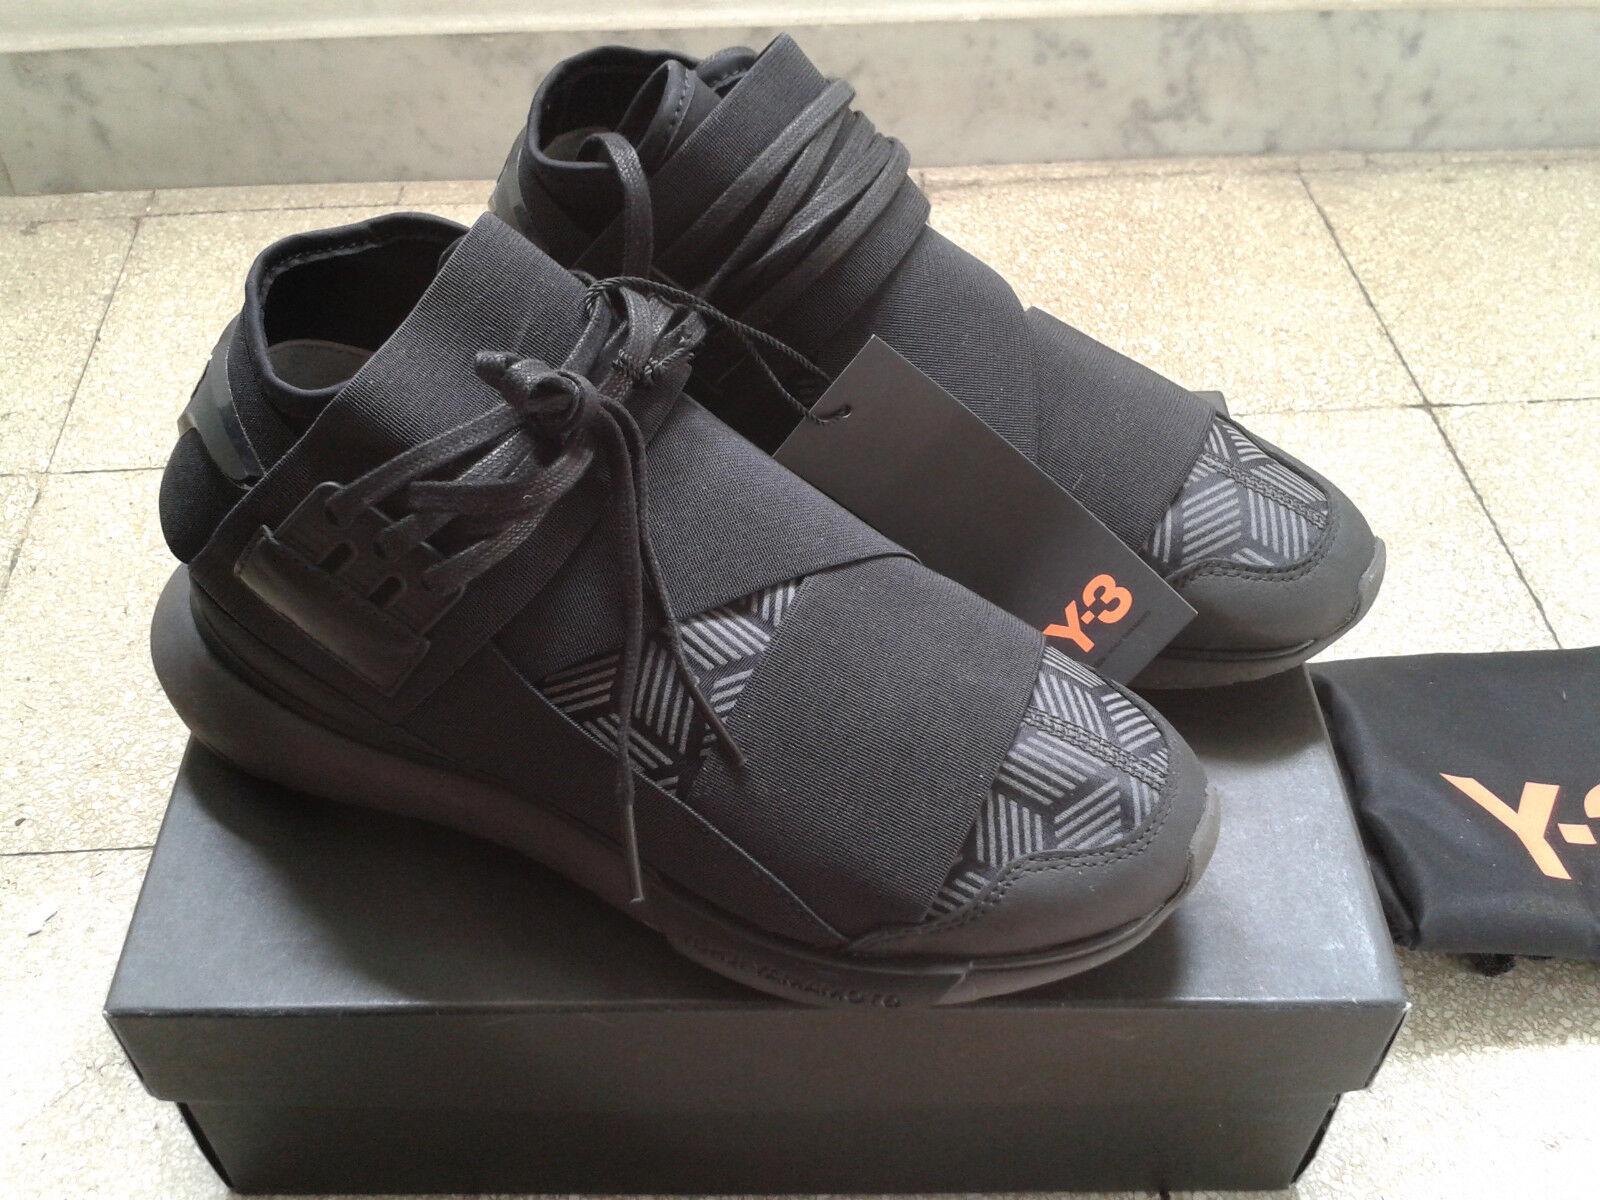 huge selection of d7f25 7ef23 Adidas Y-3 Qasa High Primeknit Yamamoto S82123 nuove mai indossate  indossate indossate 4d6cc8